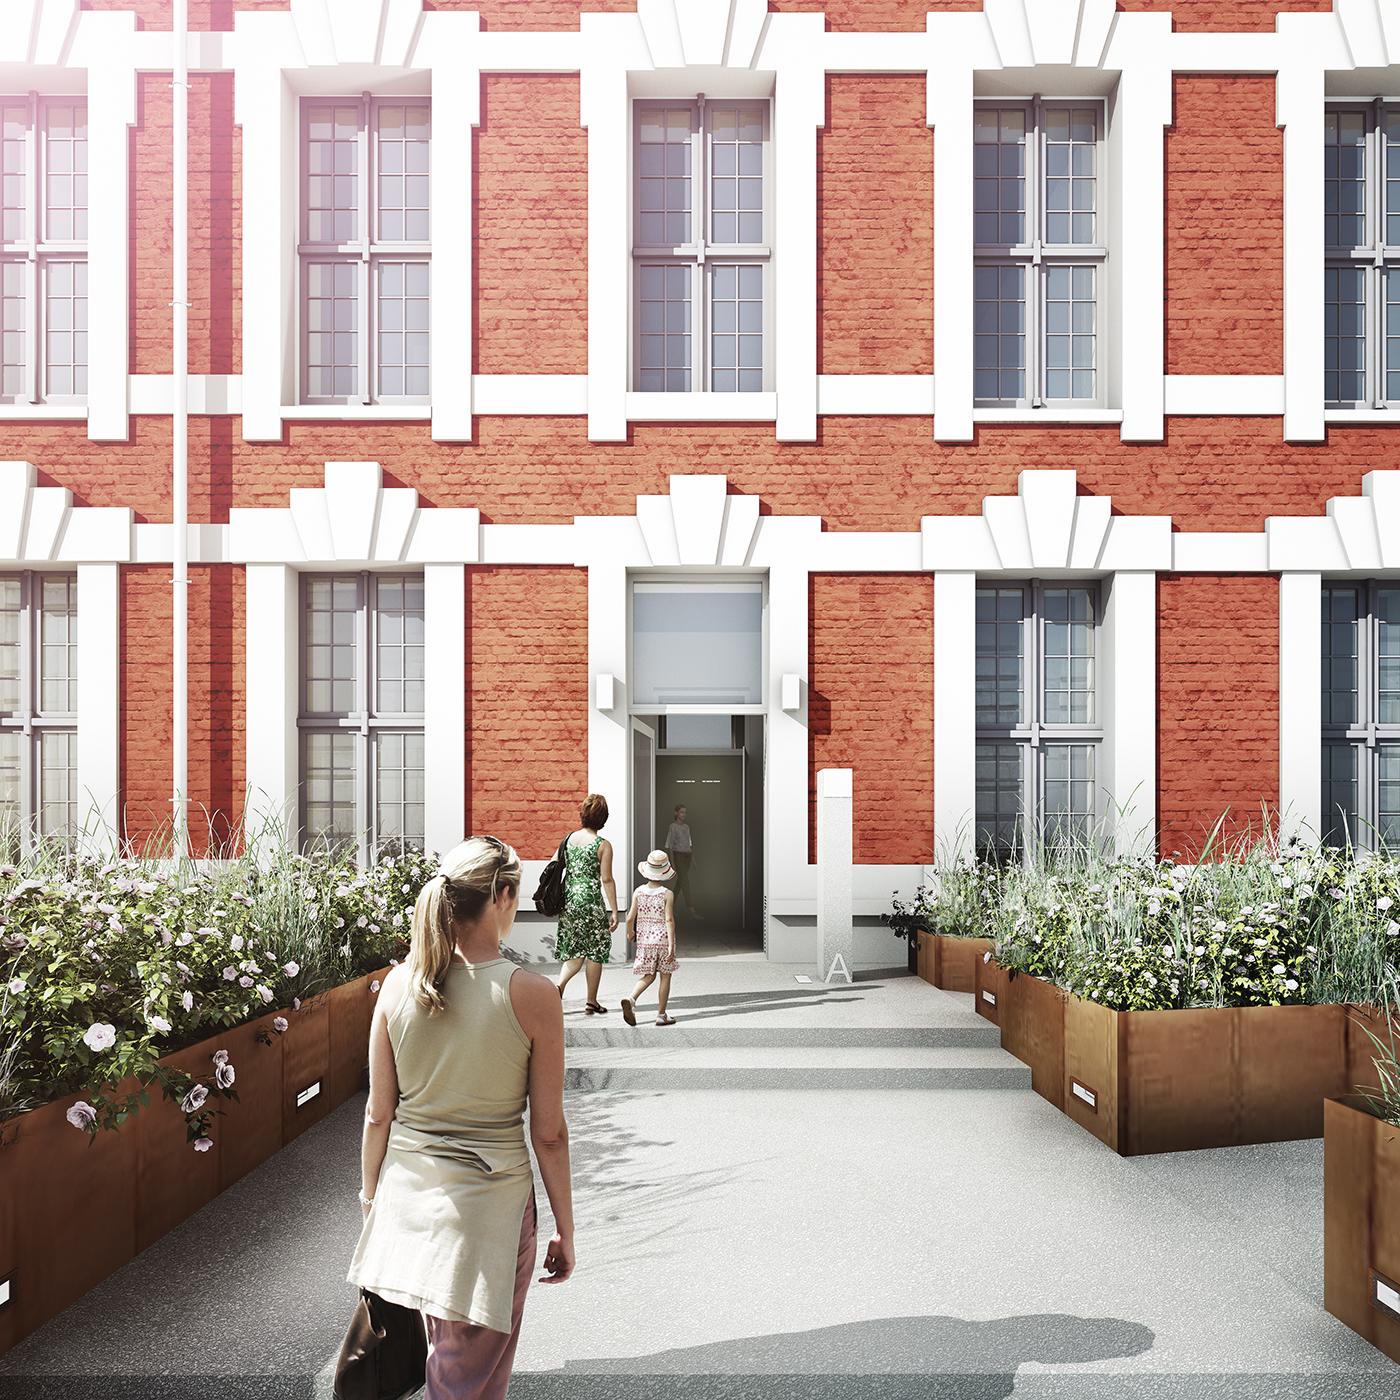 jardins l 39 anglaise g o architectes. Black Bedroom Furniture Sets. Home Design Ideas